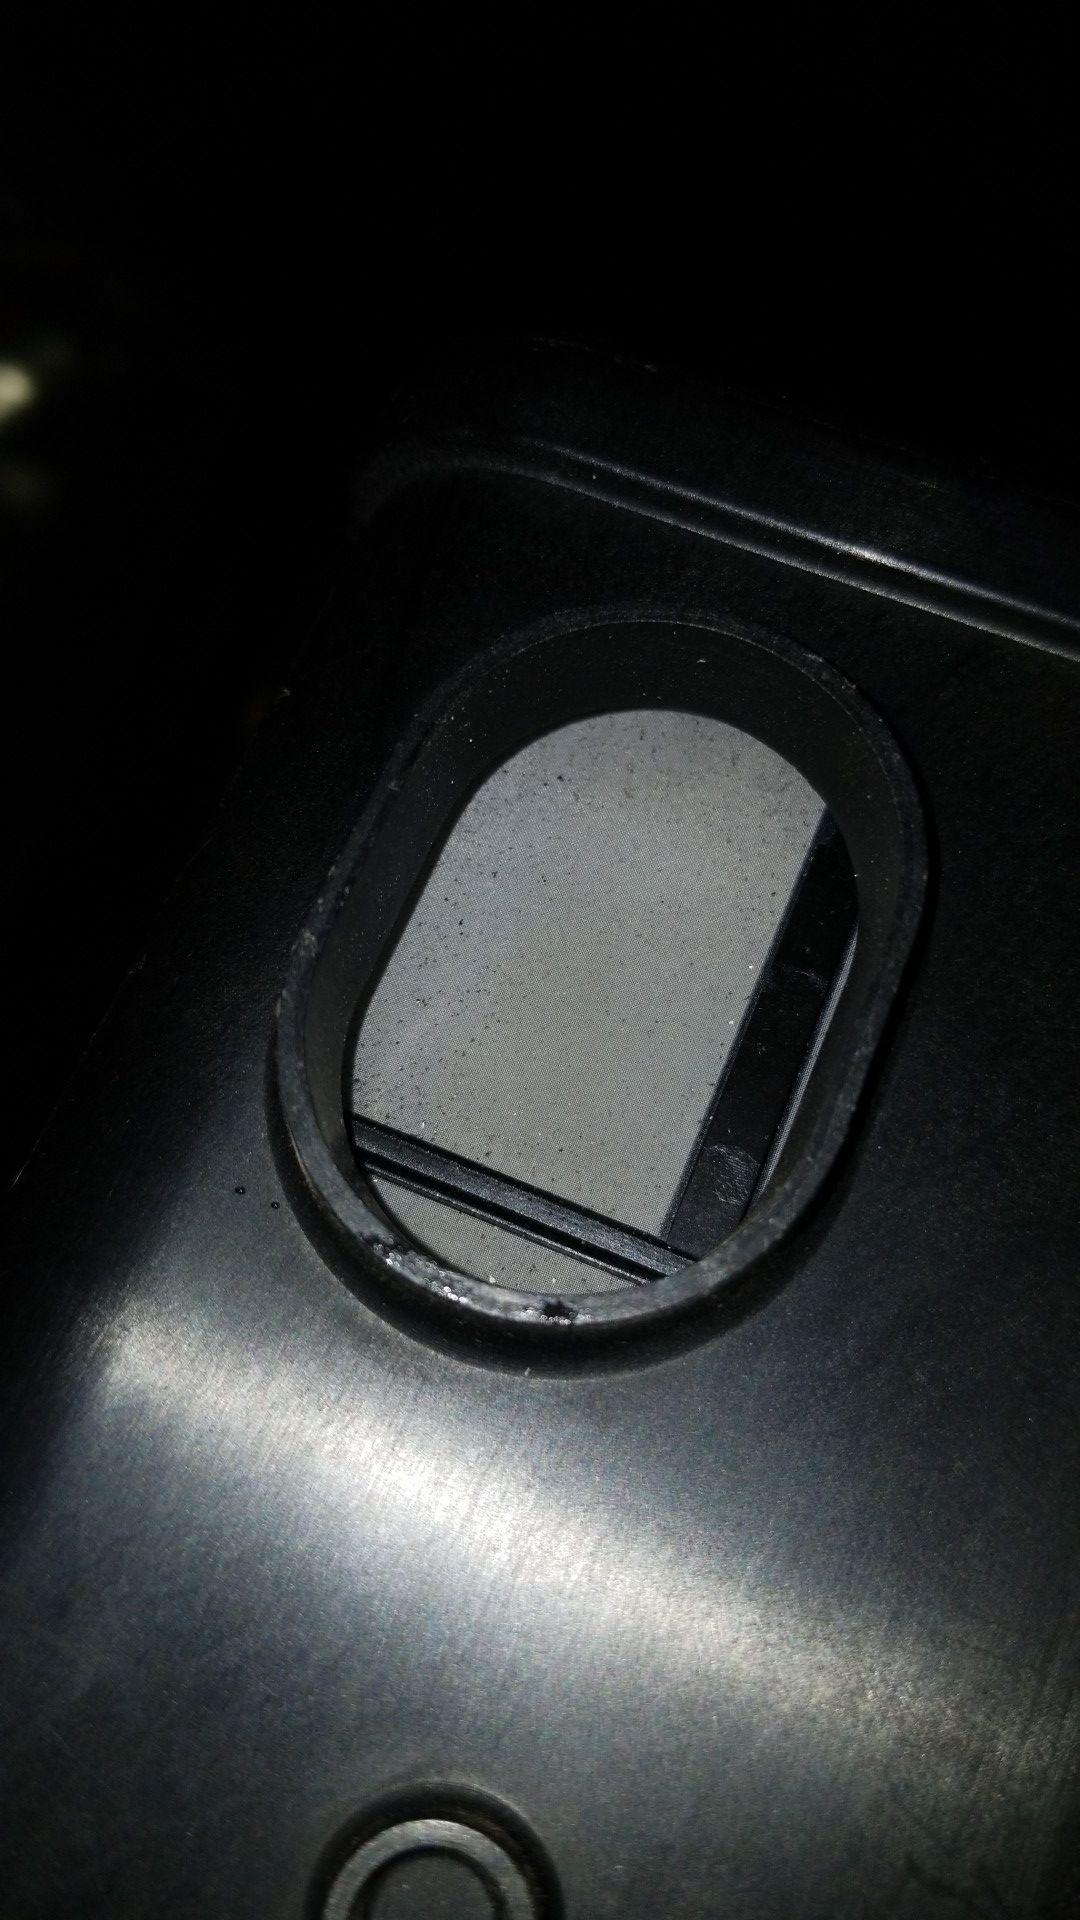 Ford part 3c3p 7g186 af transmission filter in new condition